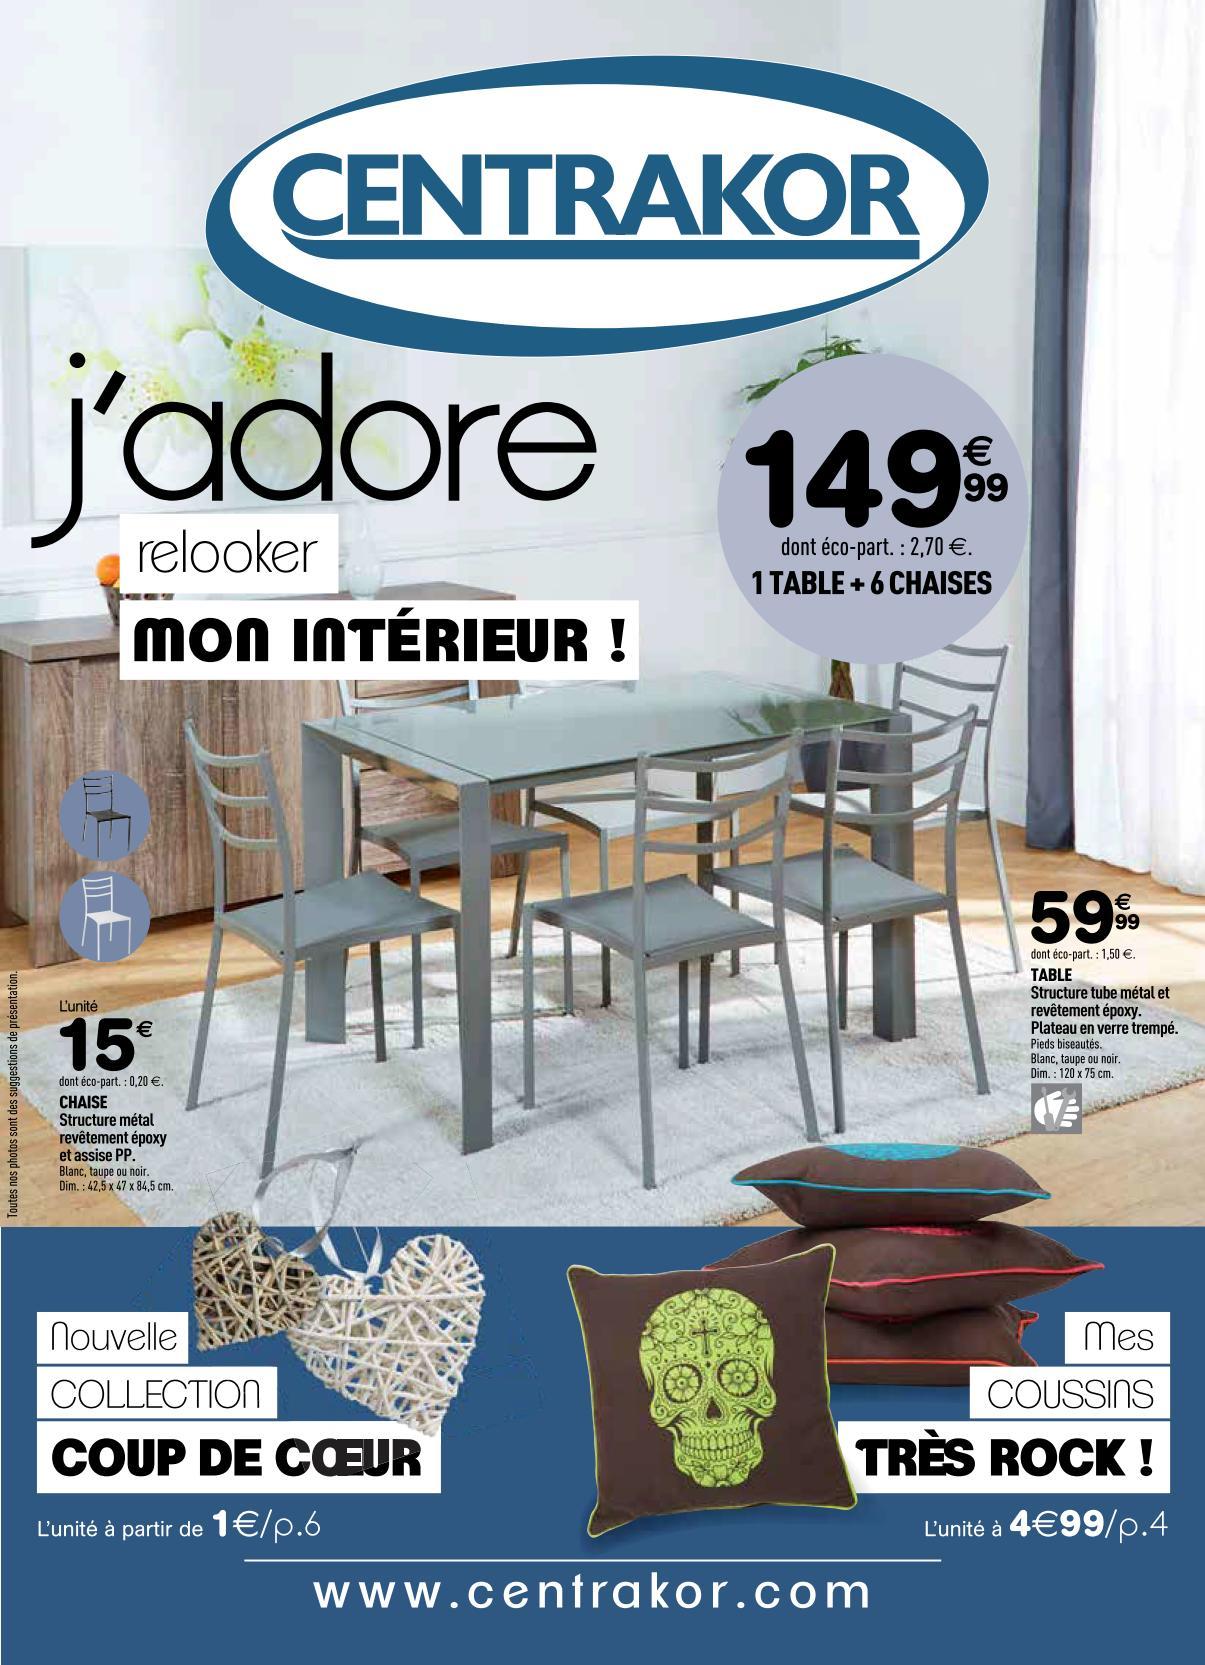 Salon De Jardin Centrakor | Salon De Jardin Centrakor